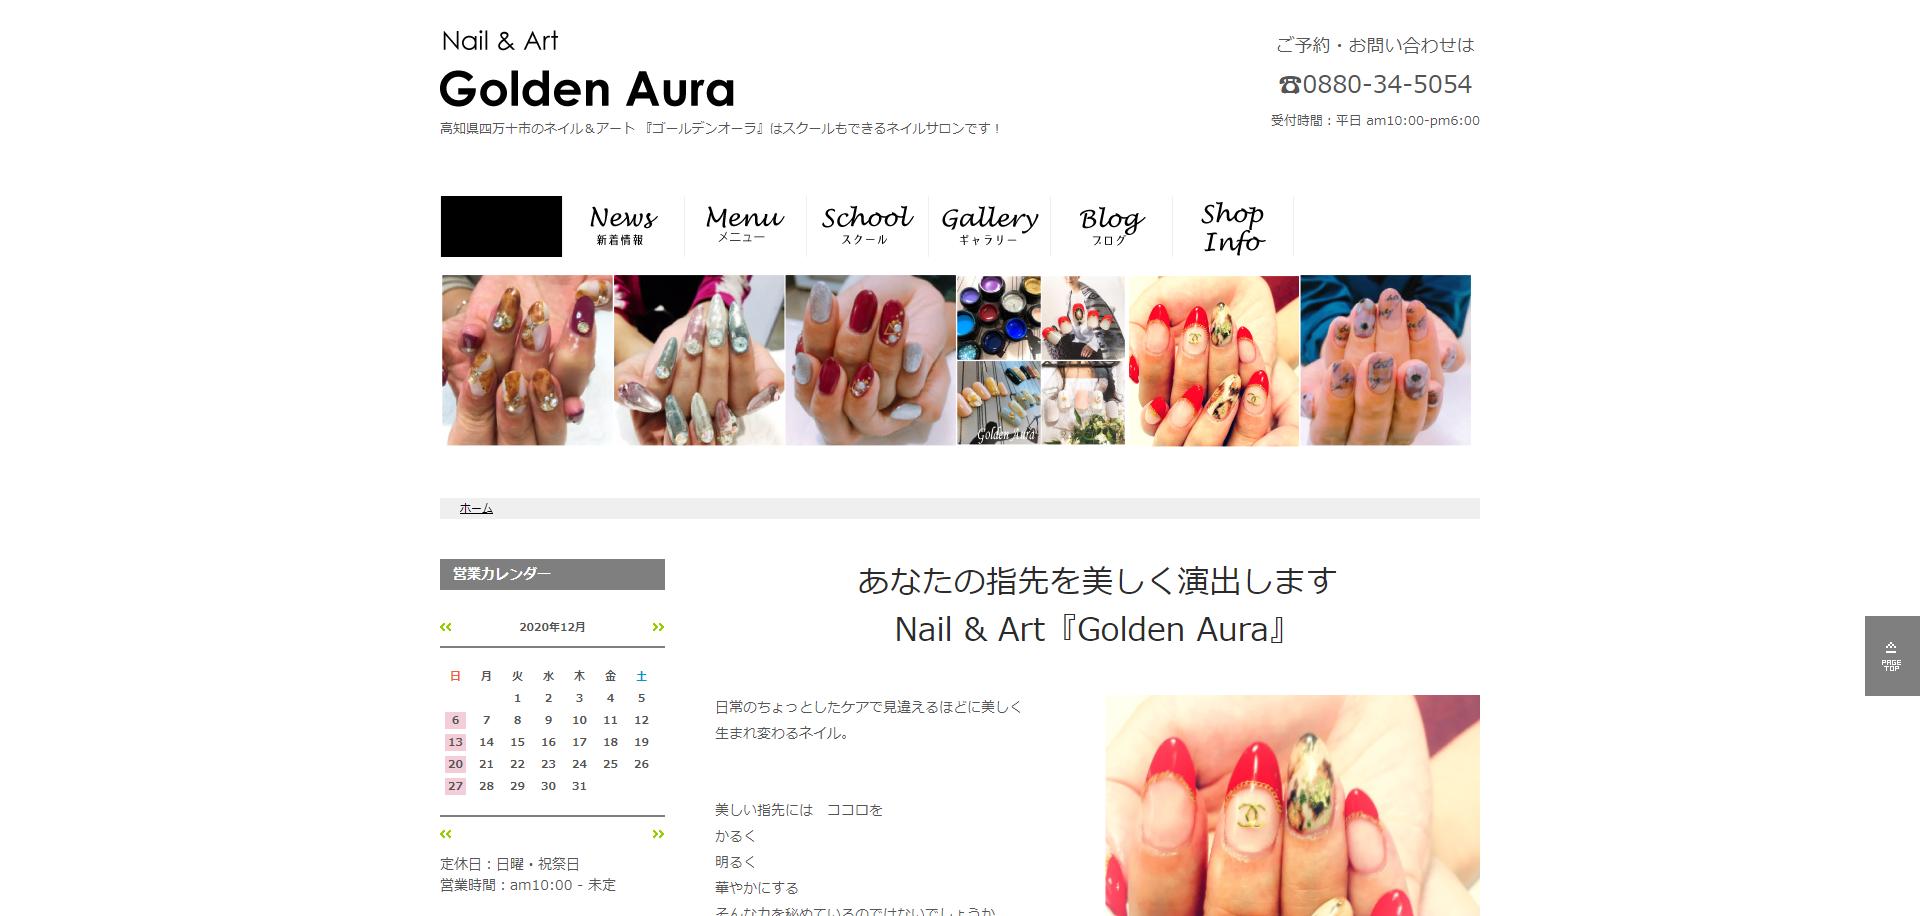 Golden Aura(ゴールデンオーラ)